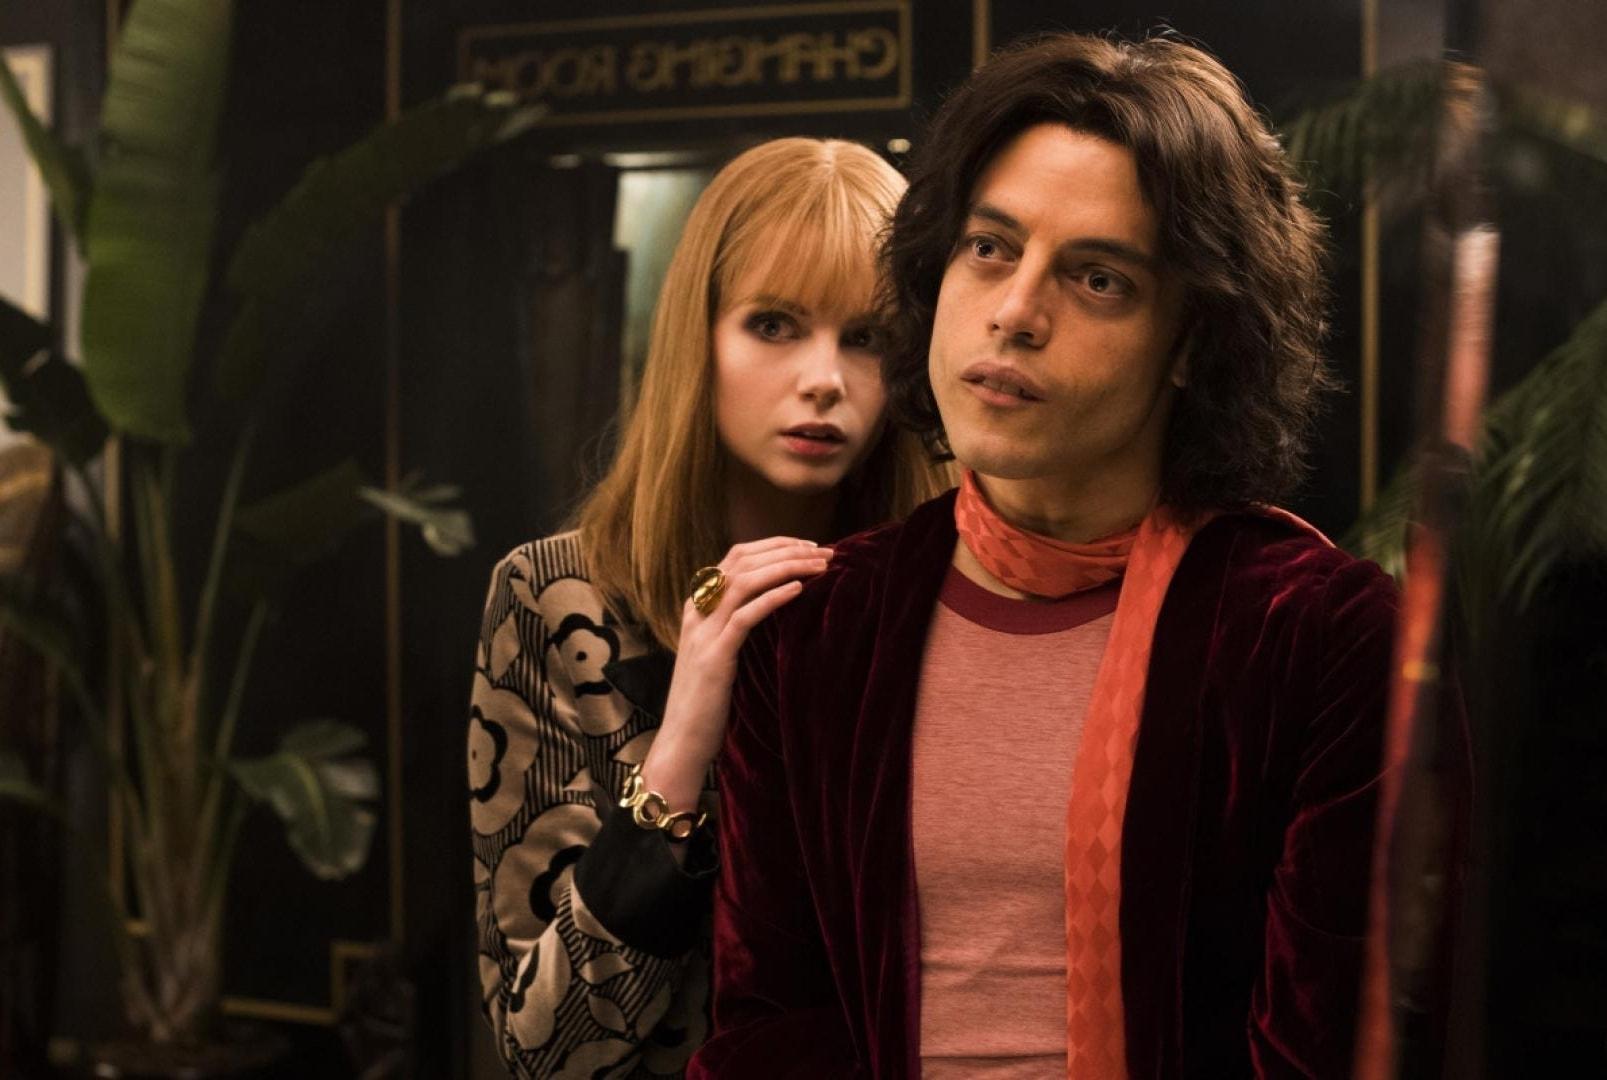 Rami Malek et Lucy Boynton dans Bohemian Rhapsody